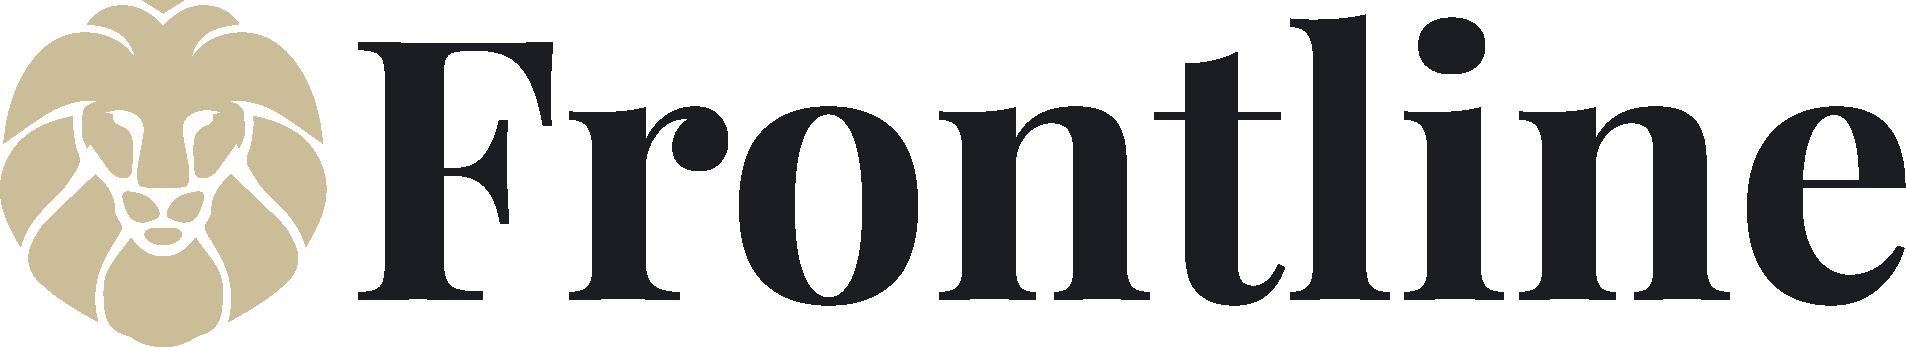 Leandro Mota | Sites, E-commerce e Soluções Web